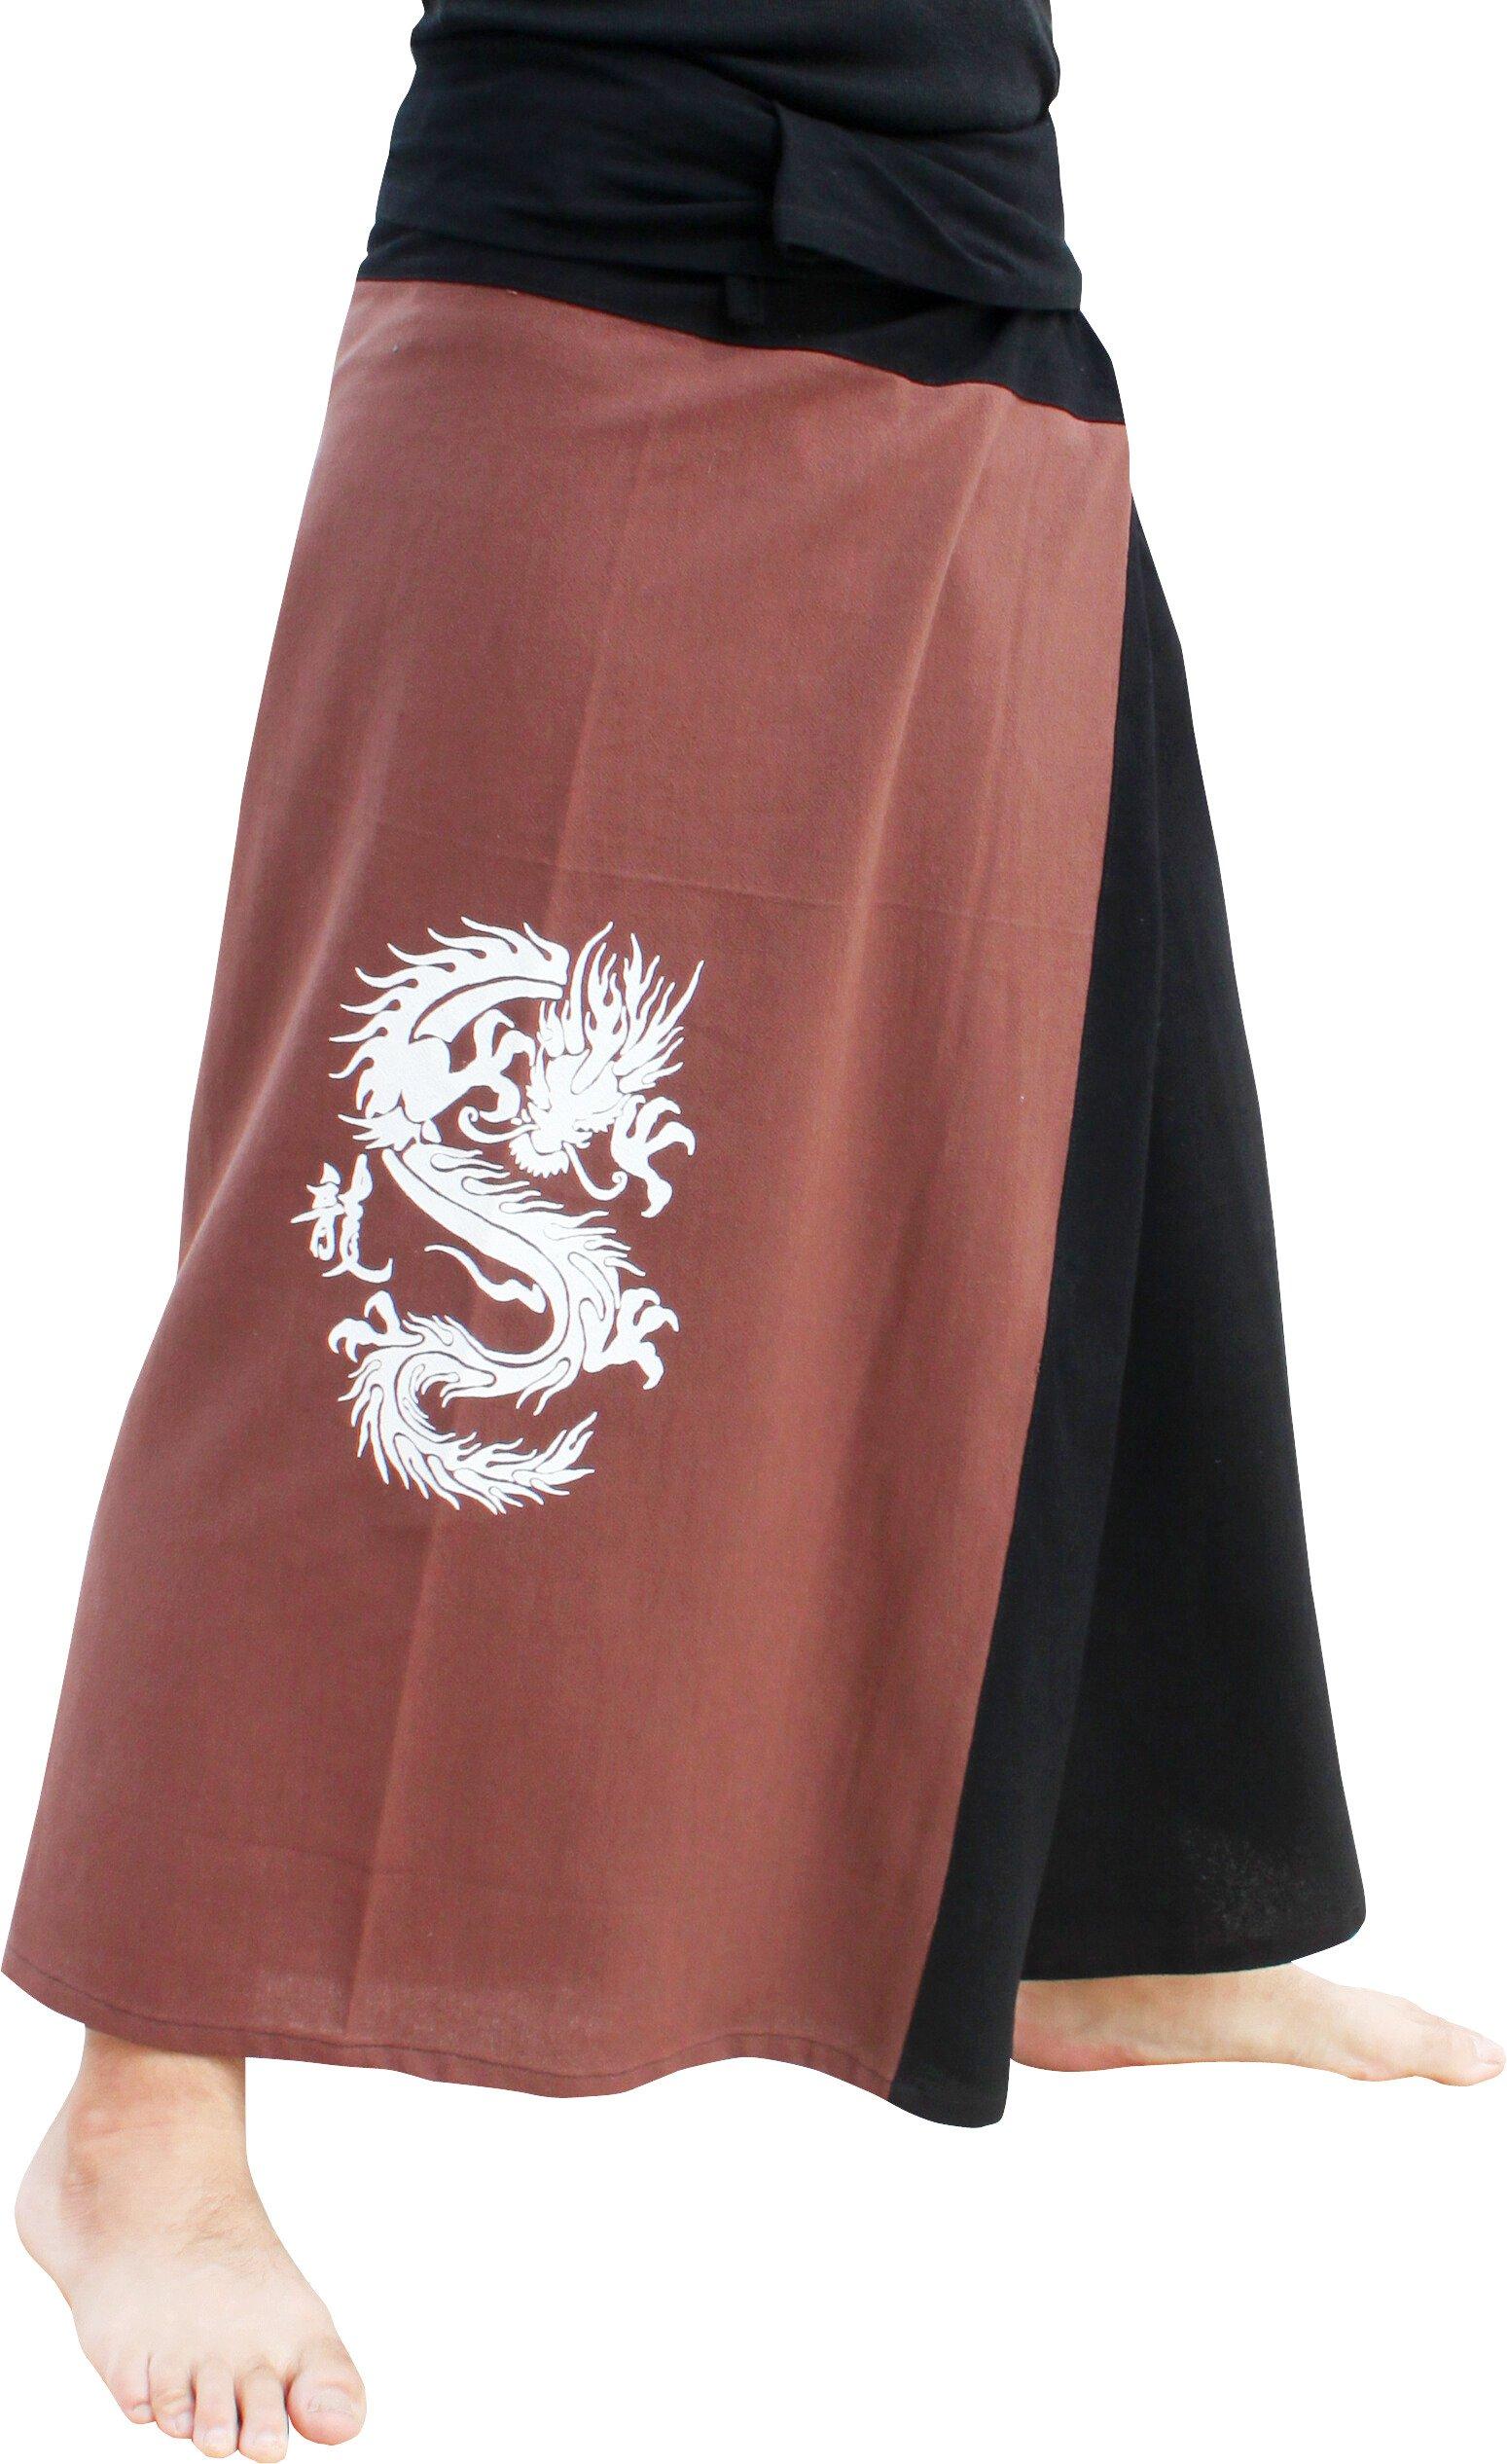 RaanPahMuang Thick Cotton Two Color Fire Dragon Samurai Wrap Pants, X-Large, Dark Brown & Black by Raan Pah Muang